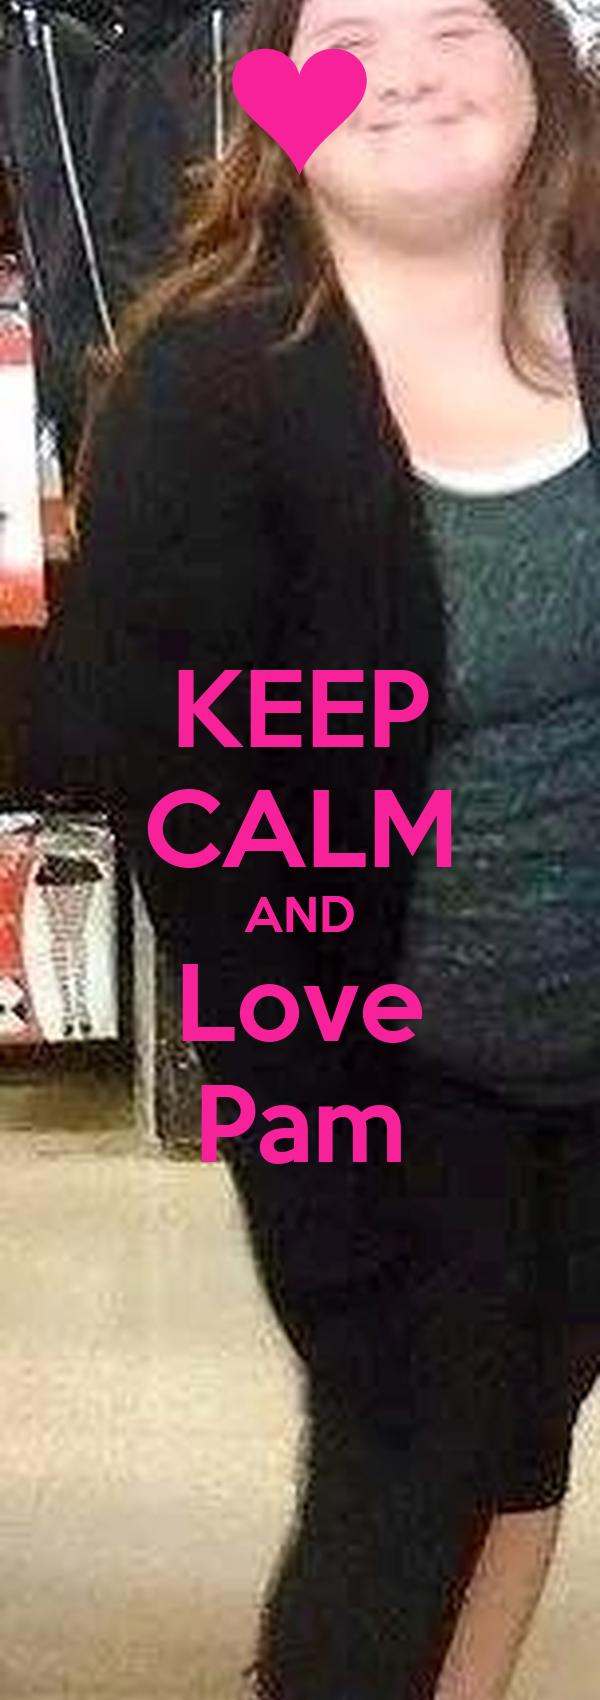 KEEP CALM AND Love Pam